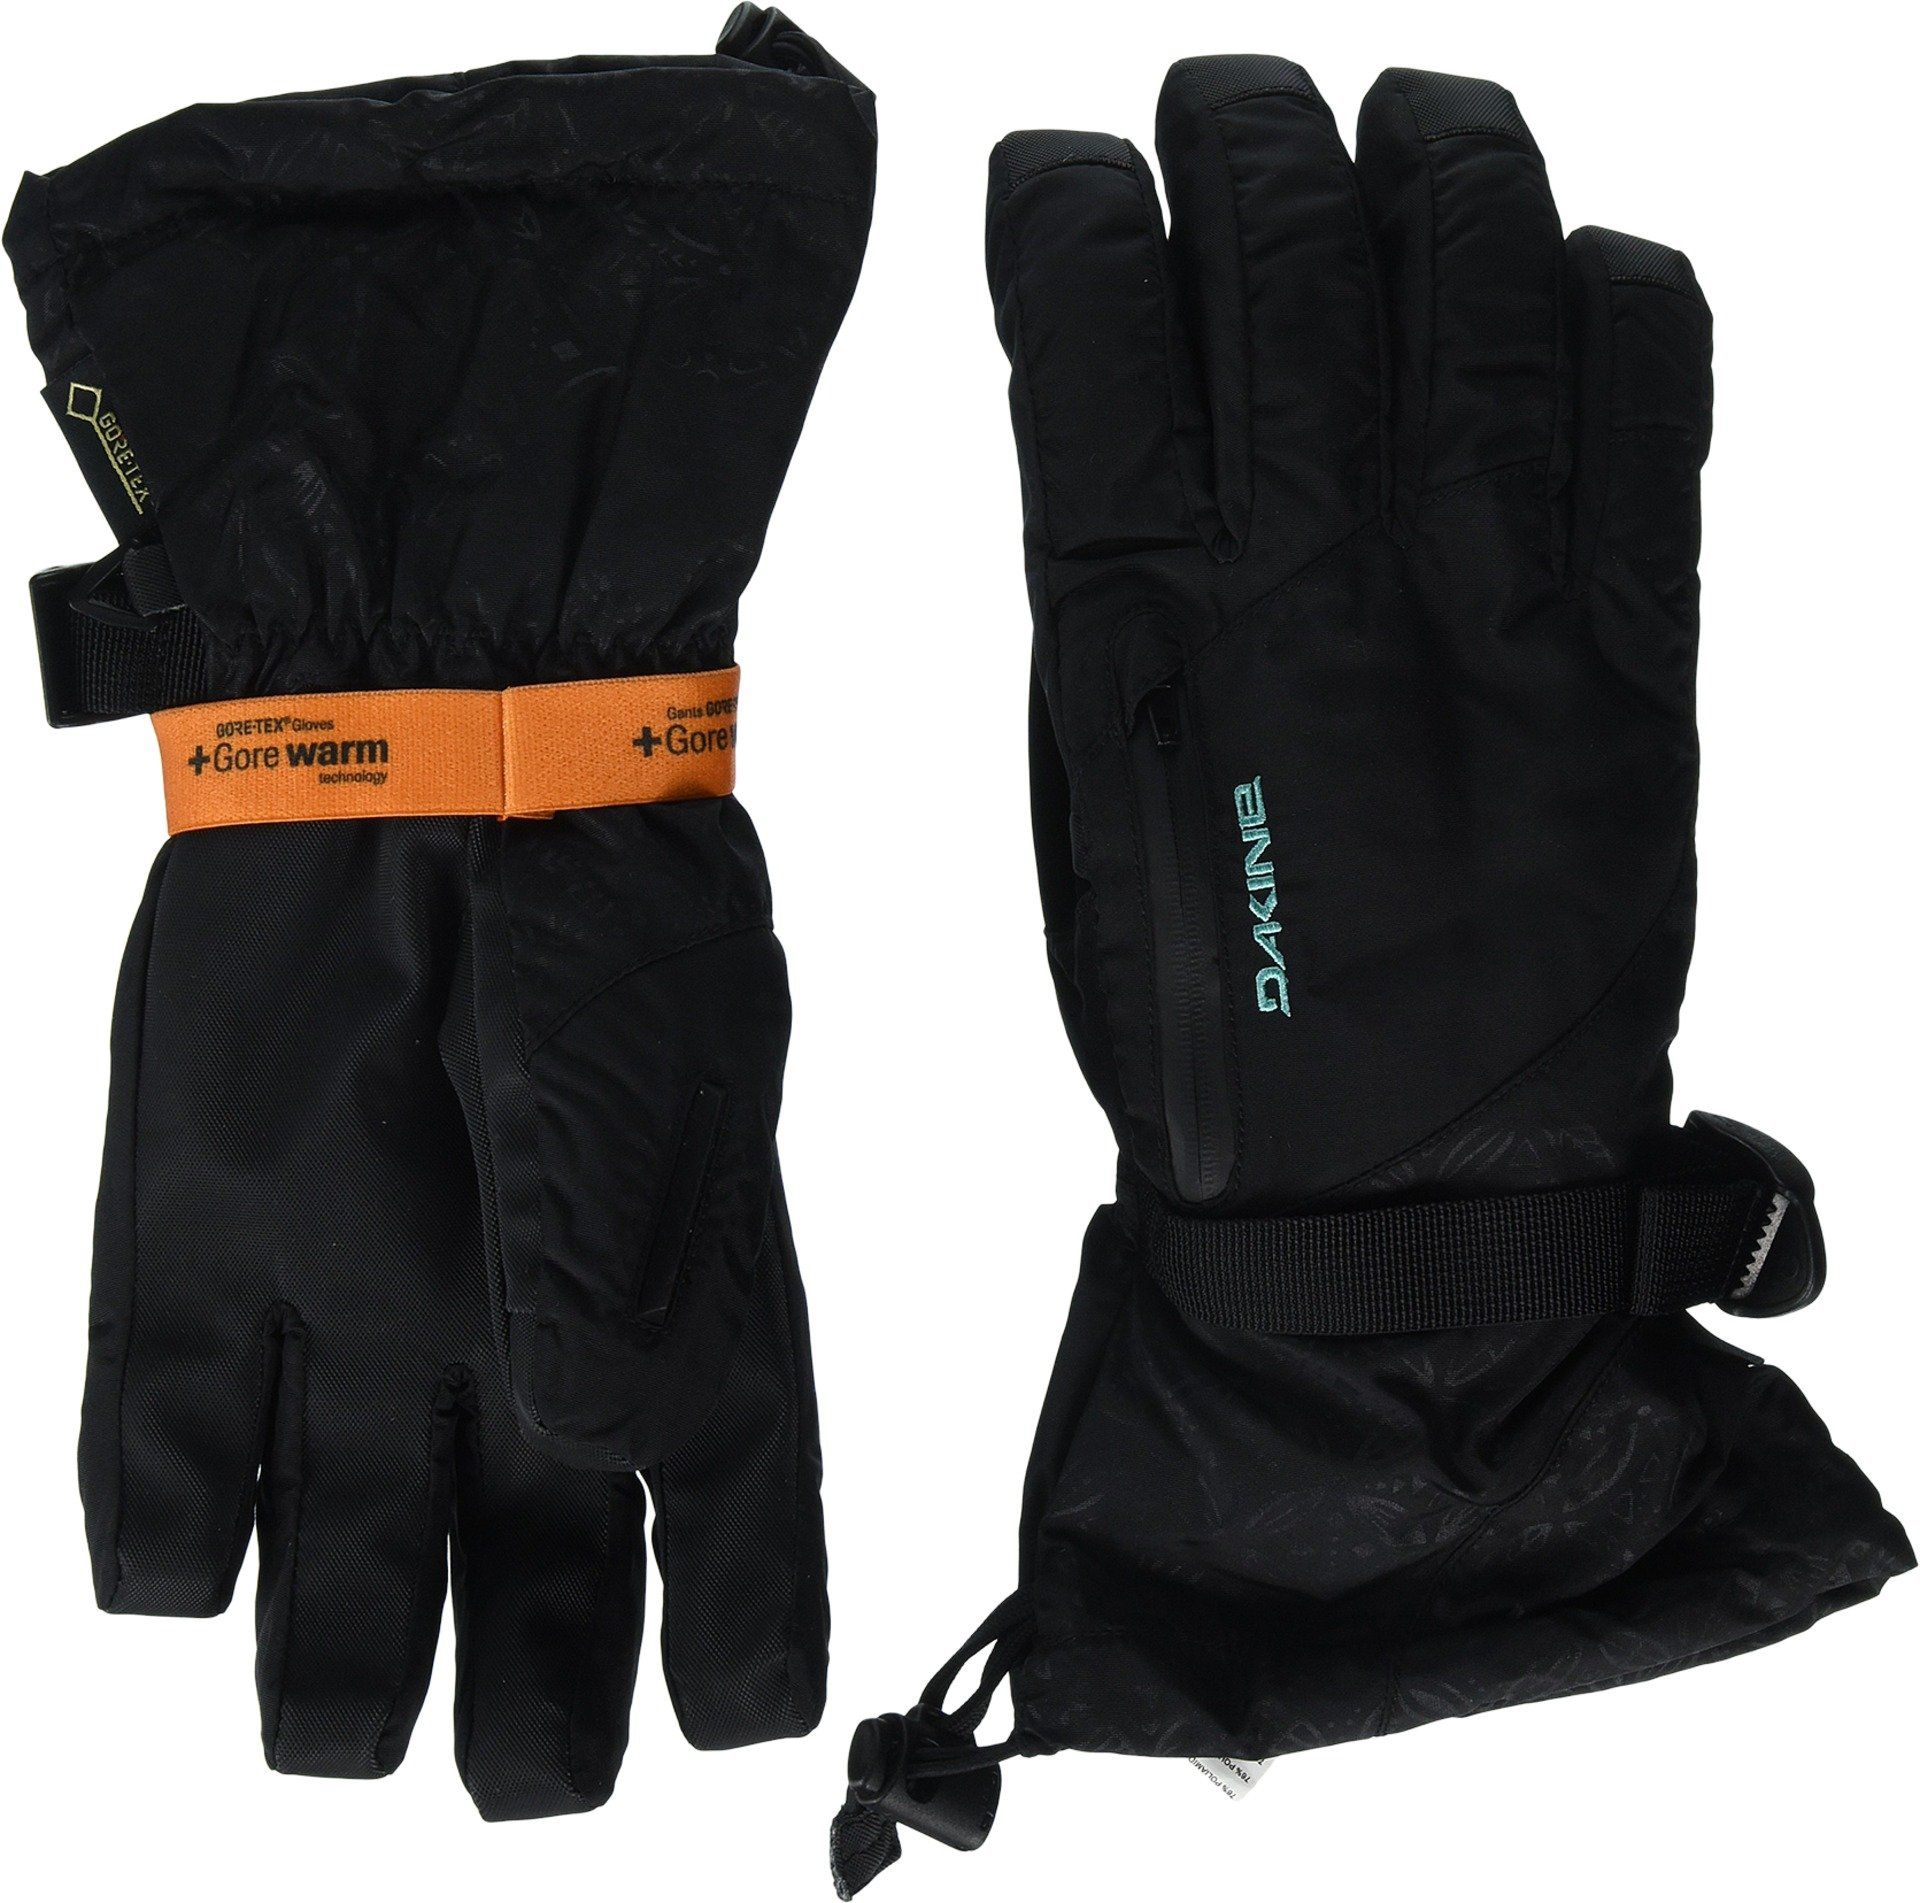 Dakine Women's Sequoia Insulated Gloves, Tory S